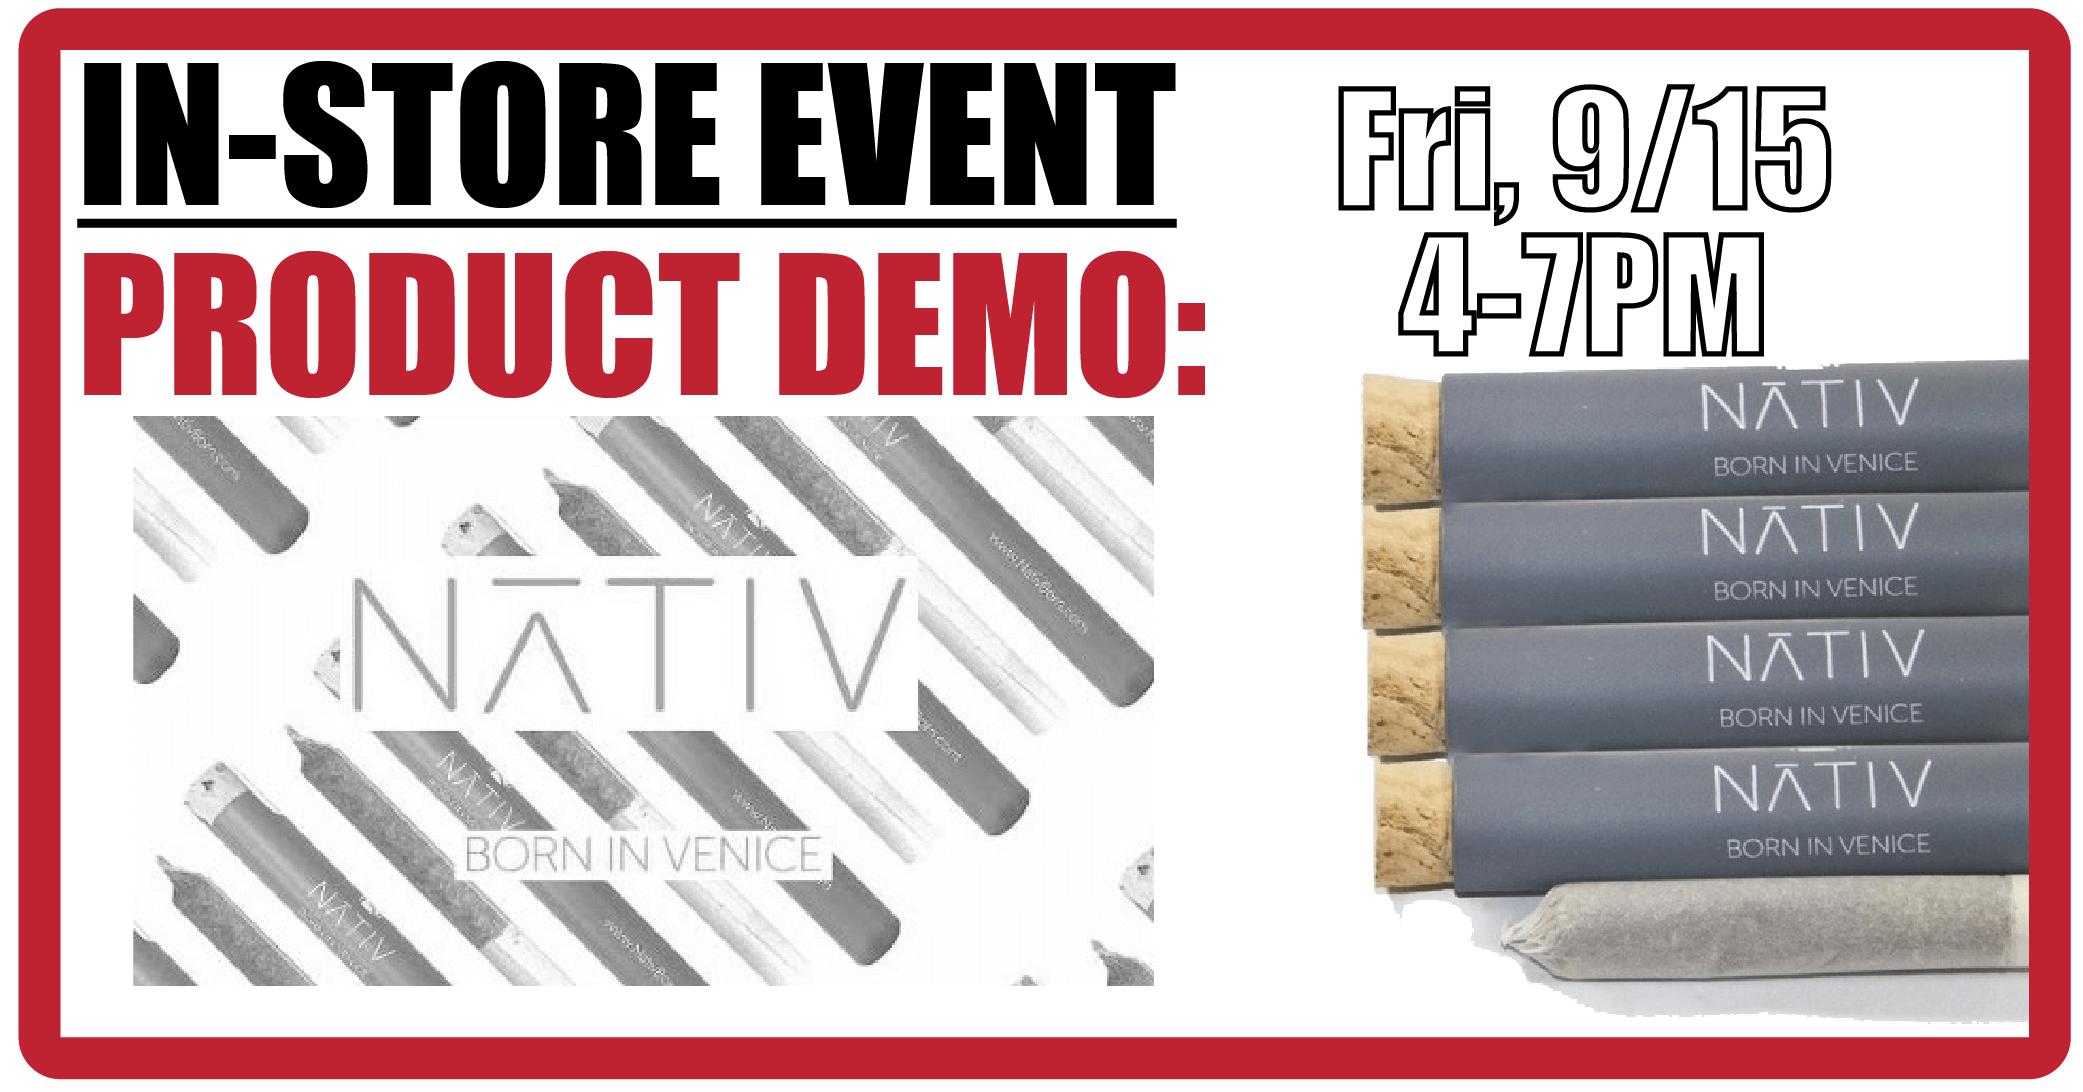 Product Demonstrations Summer 2017_Native_v0915-01 (1).png